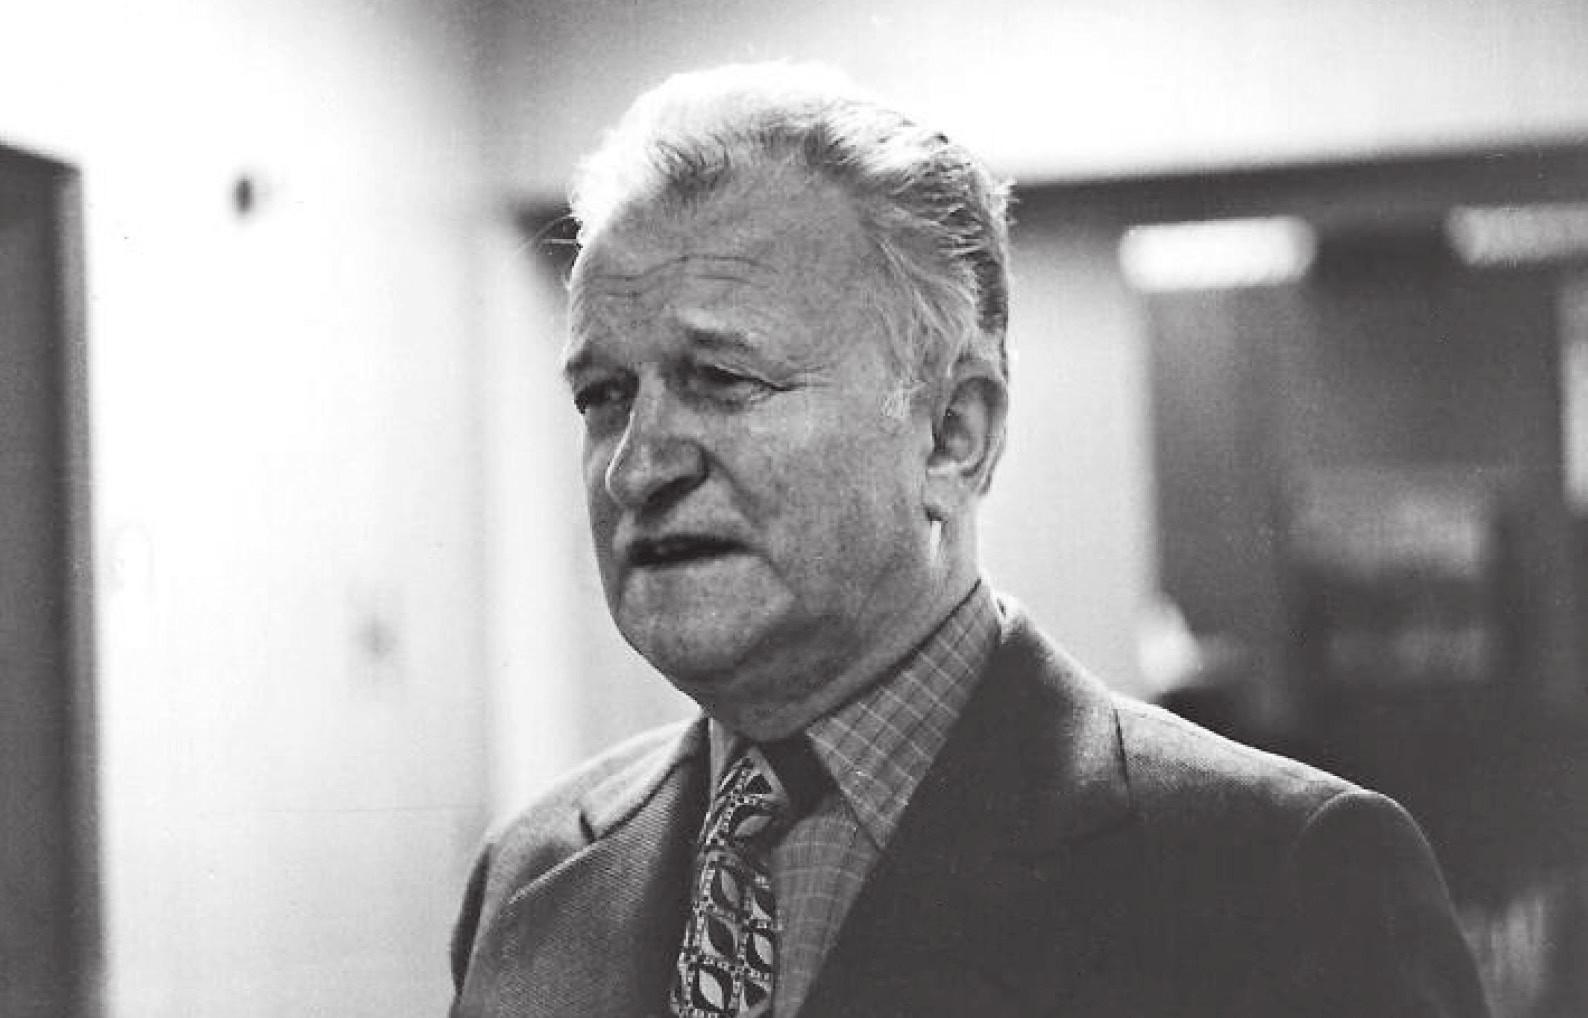 Prof. MUDr. Antonín Rubín, DrSc., prezident Evropské společnosti pediatrické radiologie, předseda 19. kongresu Evropské společnosti pediatrické radiologie v Praze 1982.